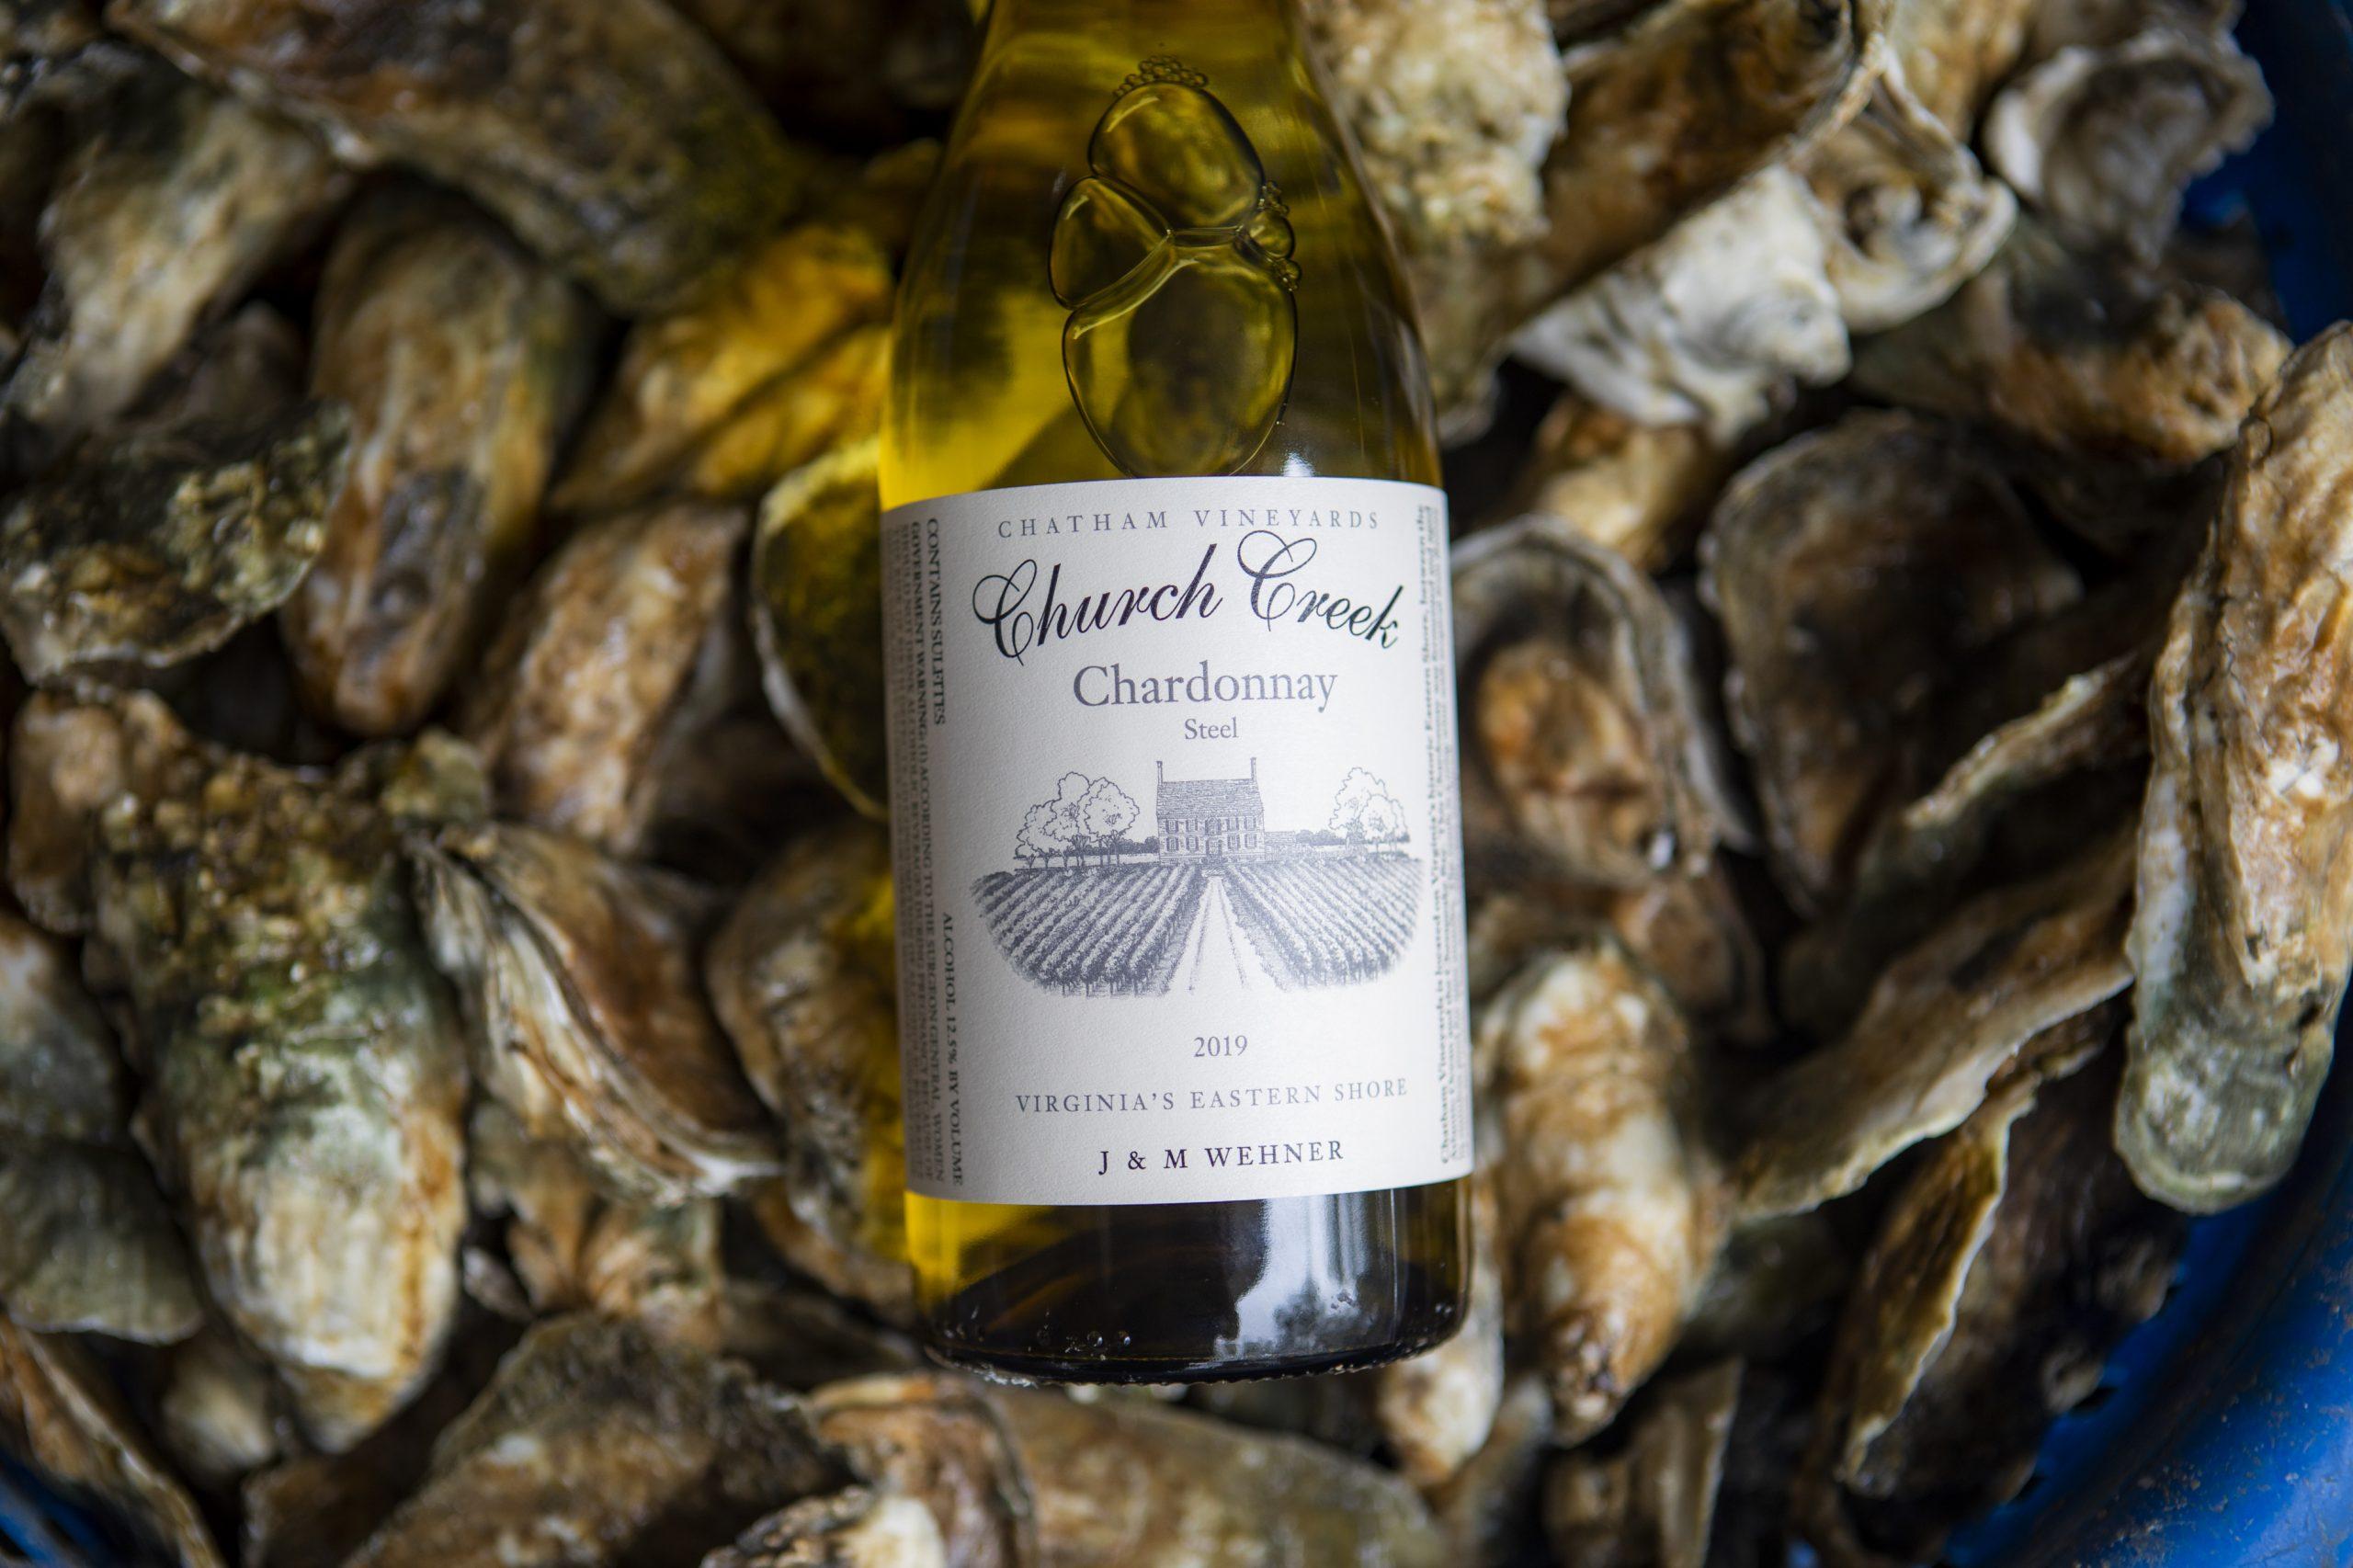 Church Creek Chardonnay and Oysters